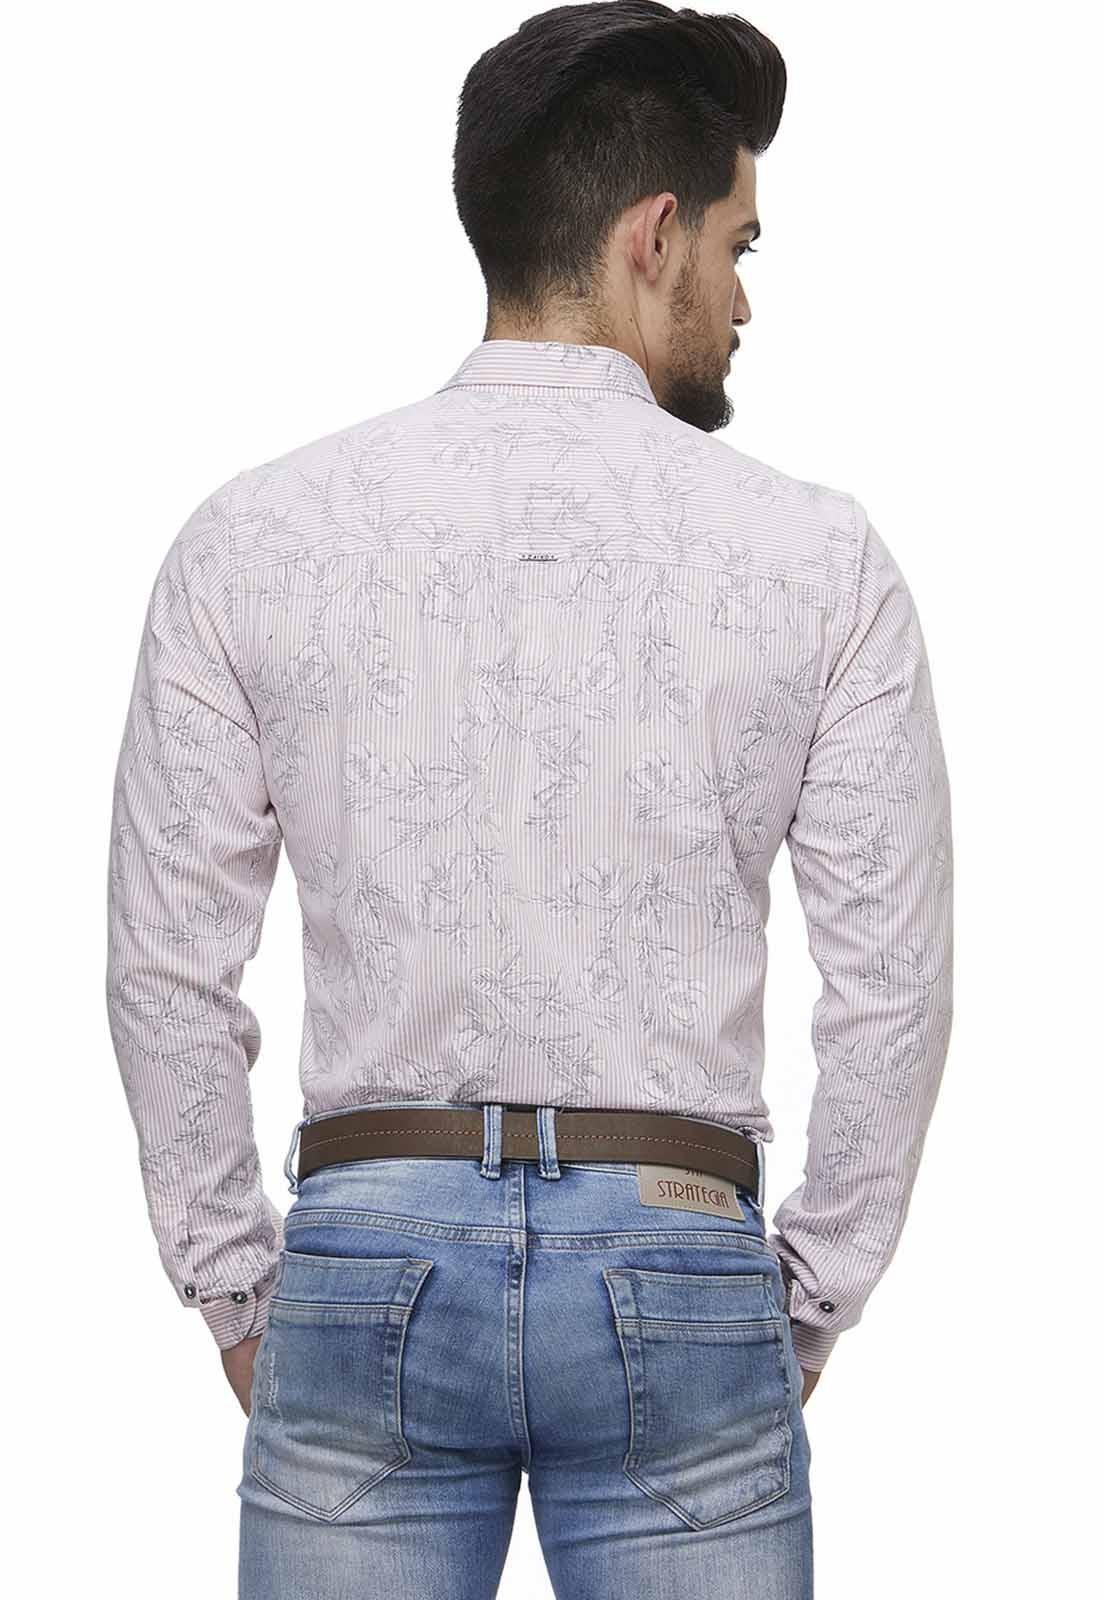 Camisa Fit Zaiko Masculina Estampada Manga Longa 1686rosa